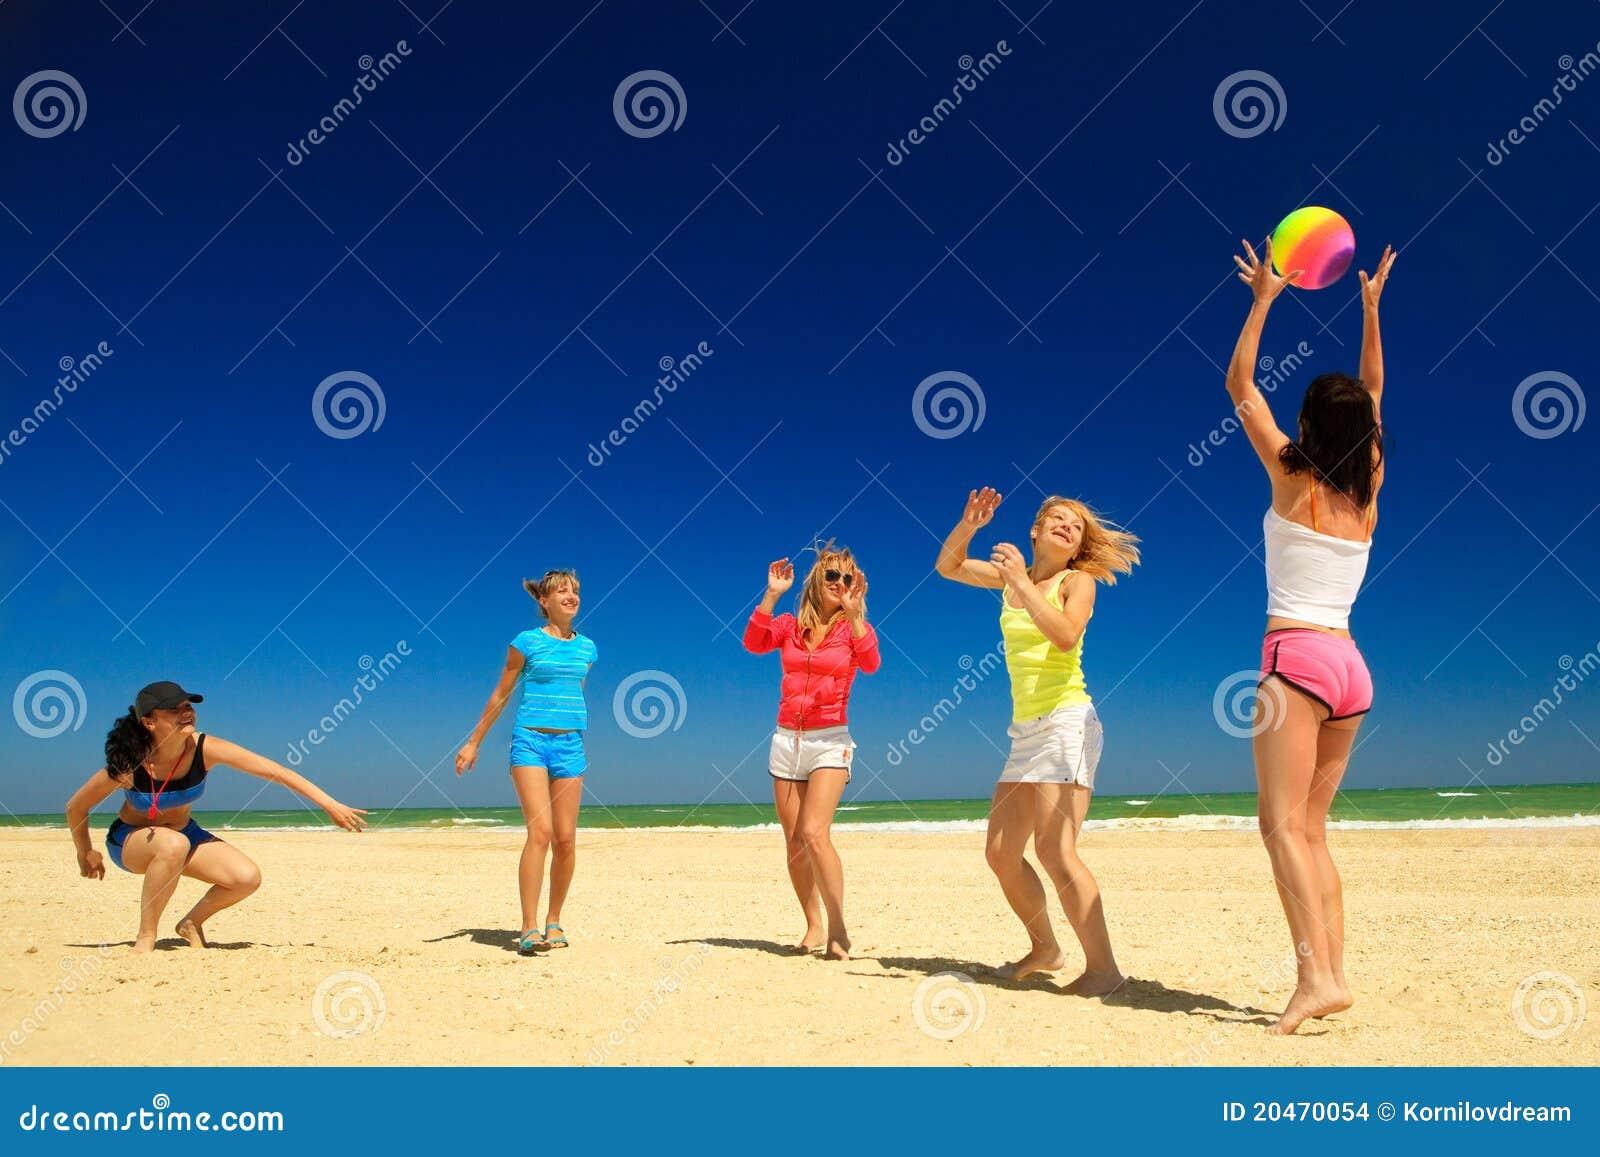 Joyful Girls Playing Volleyball Stock Photo - Image of